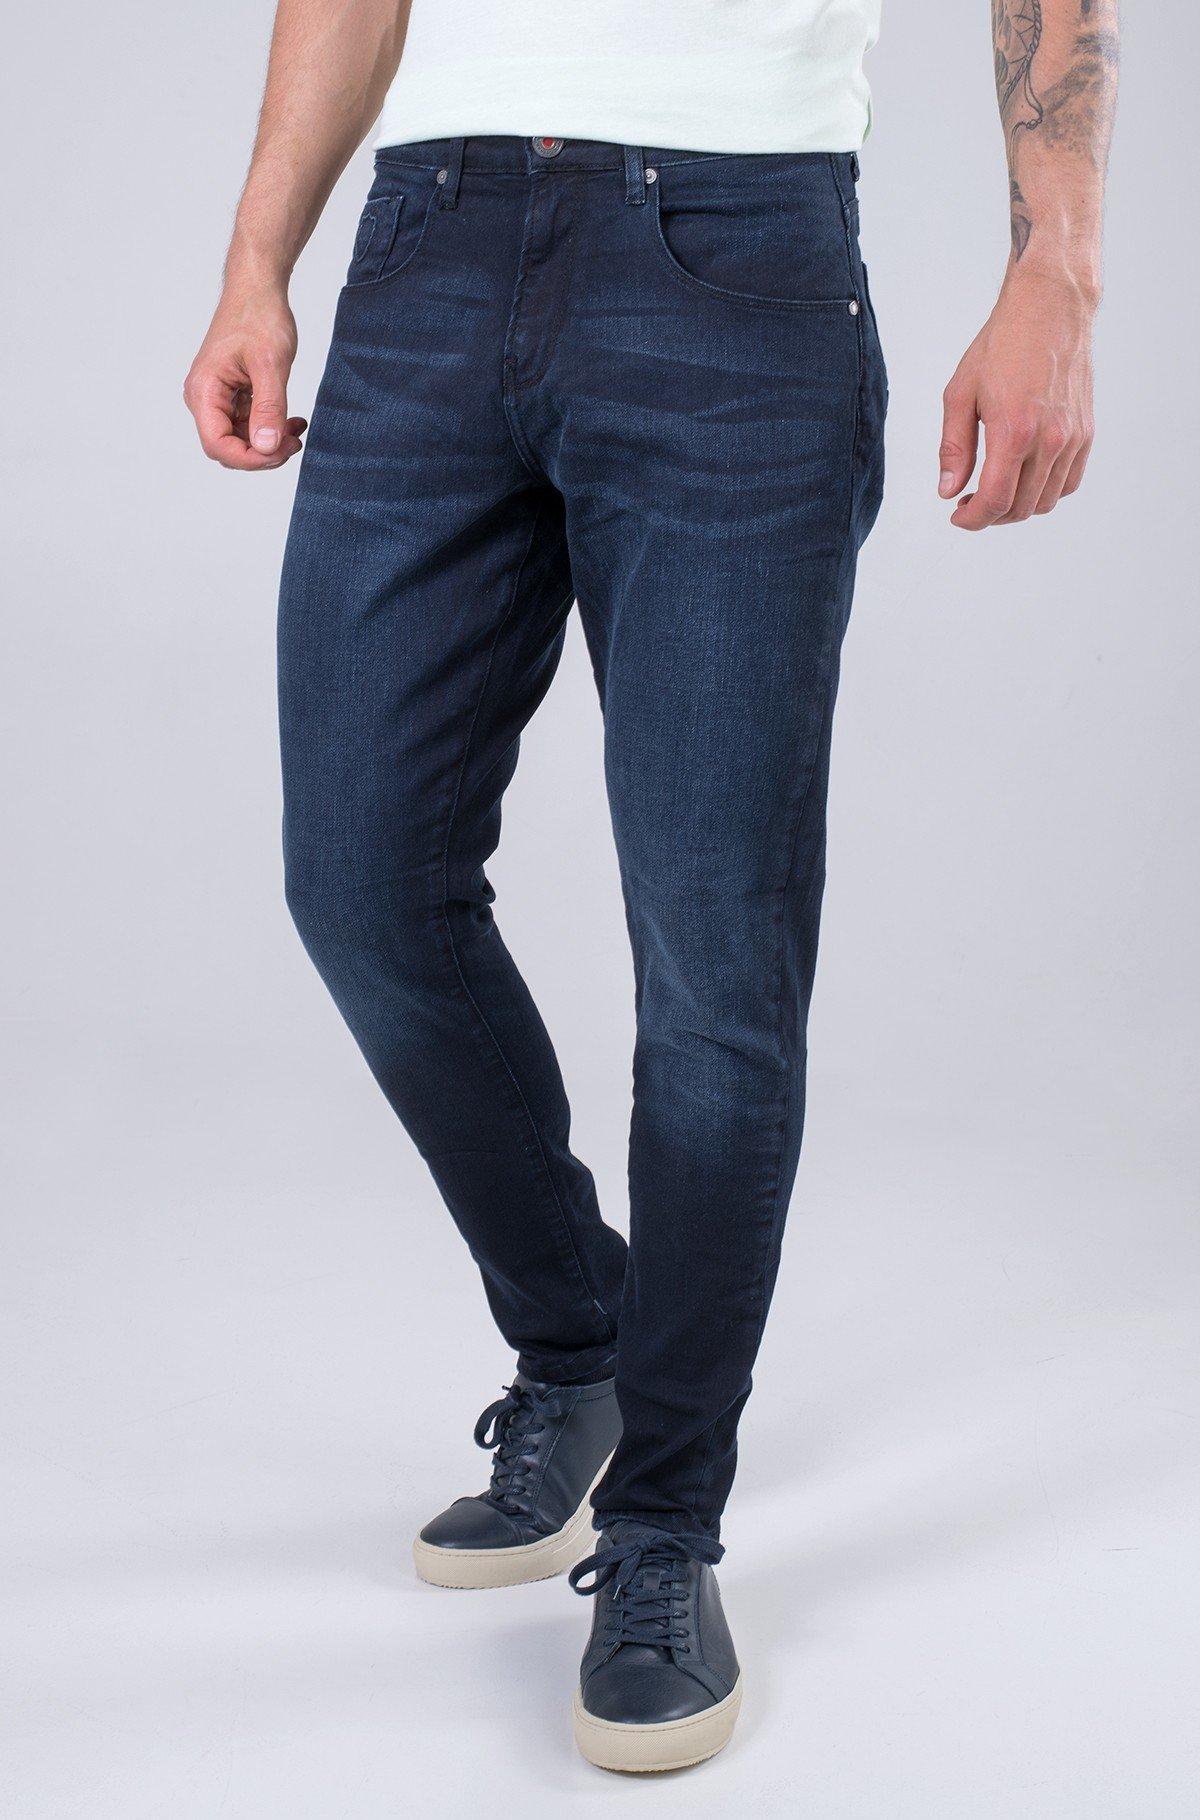 Jeans MORIARTY LAK 517-full-1